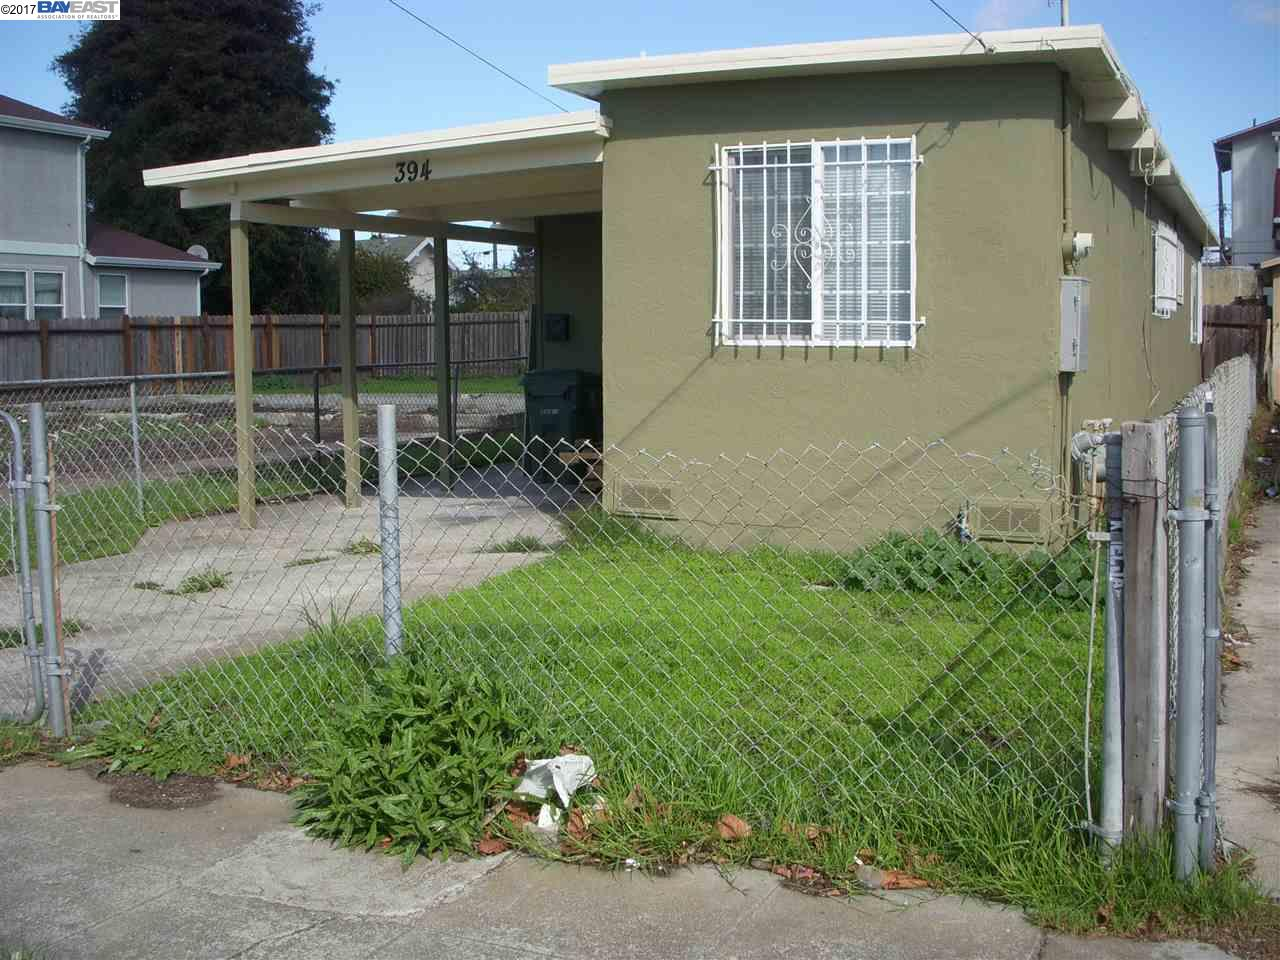 394 S 34TH ST, RICHMOND, CA 94804